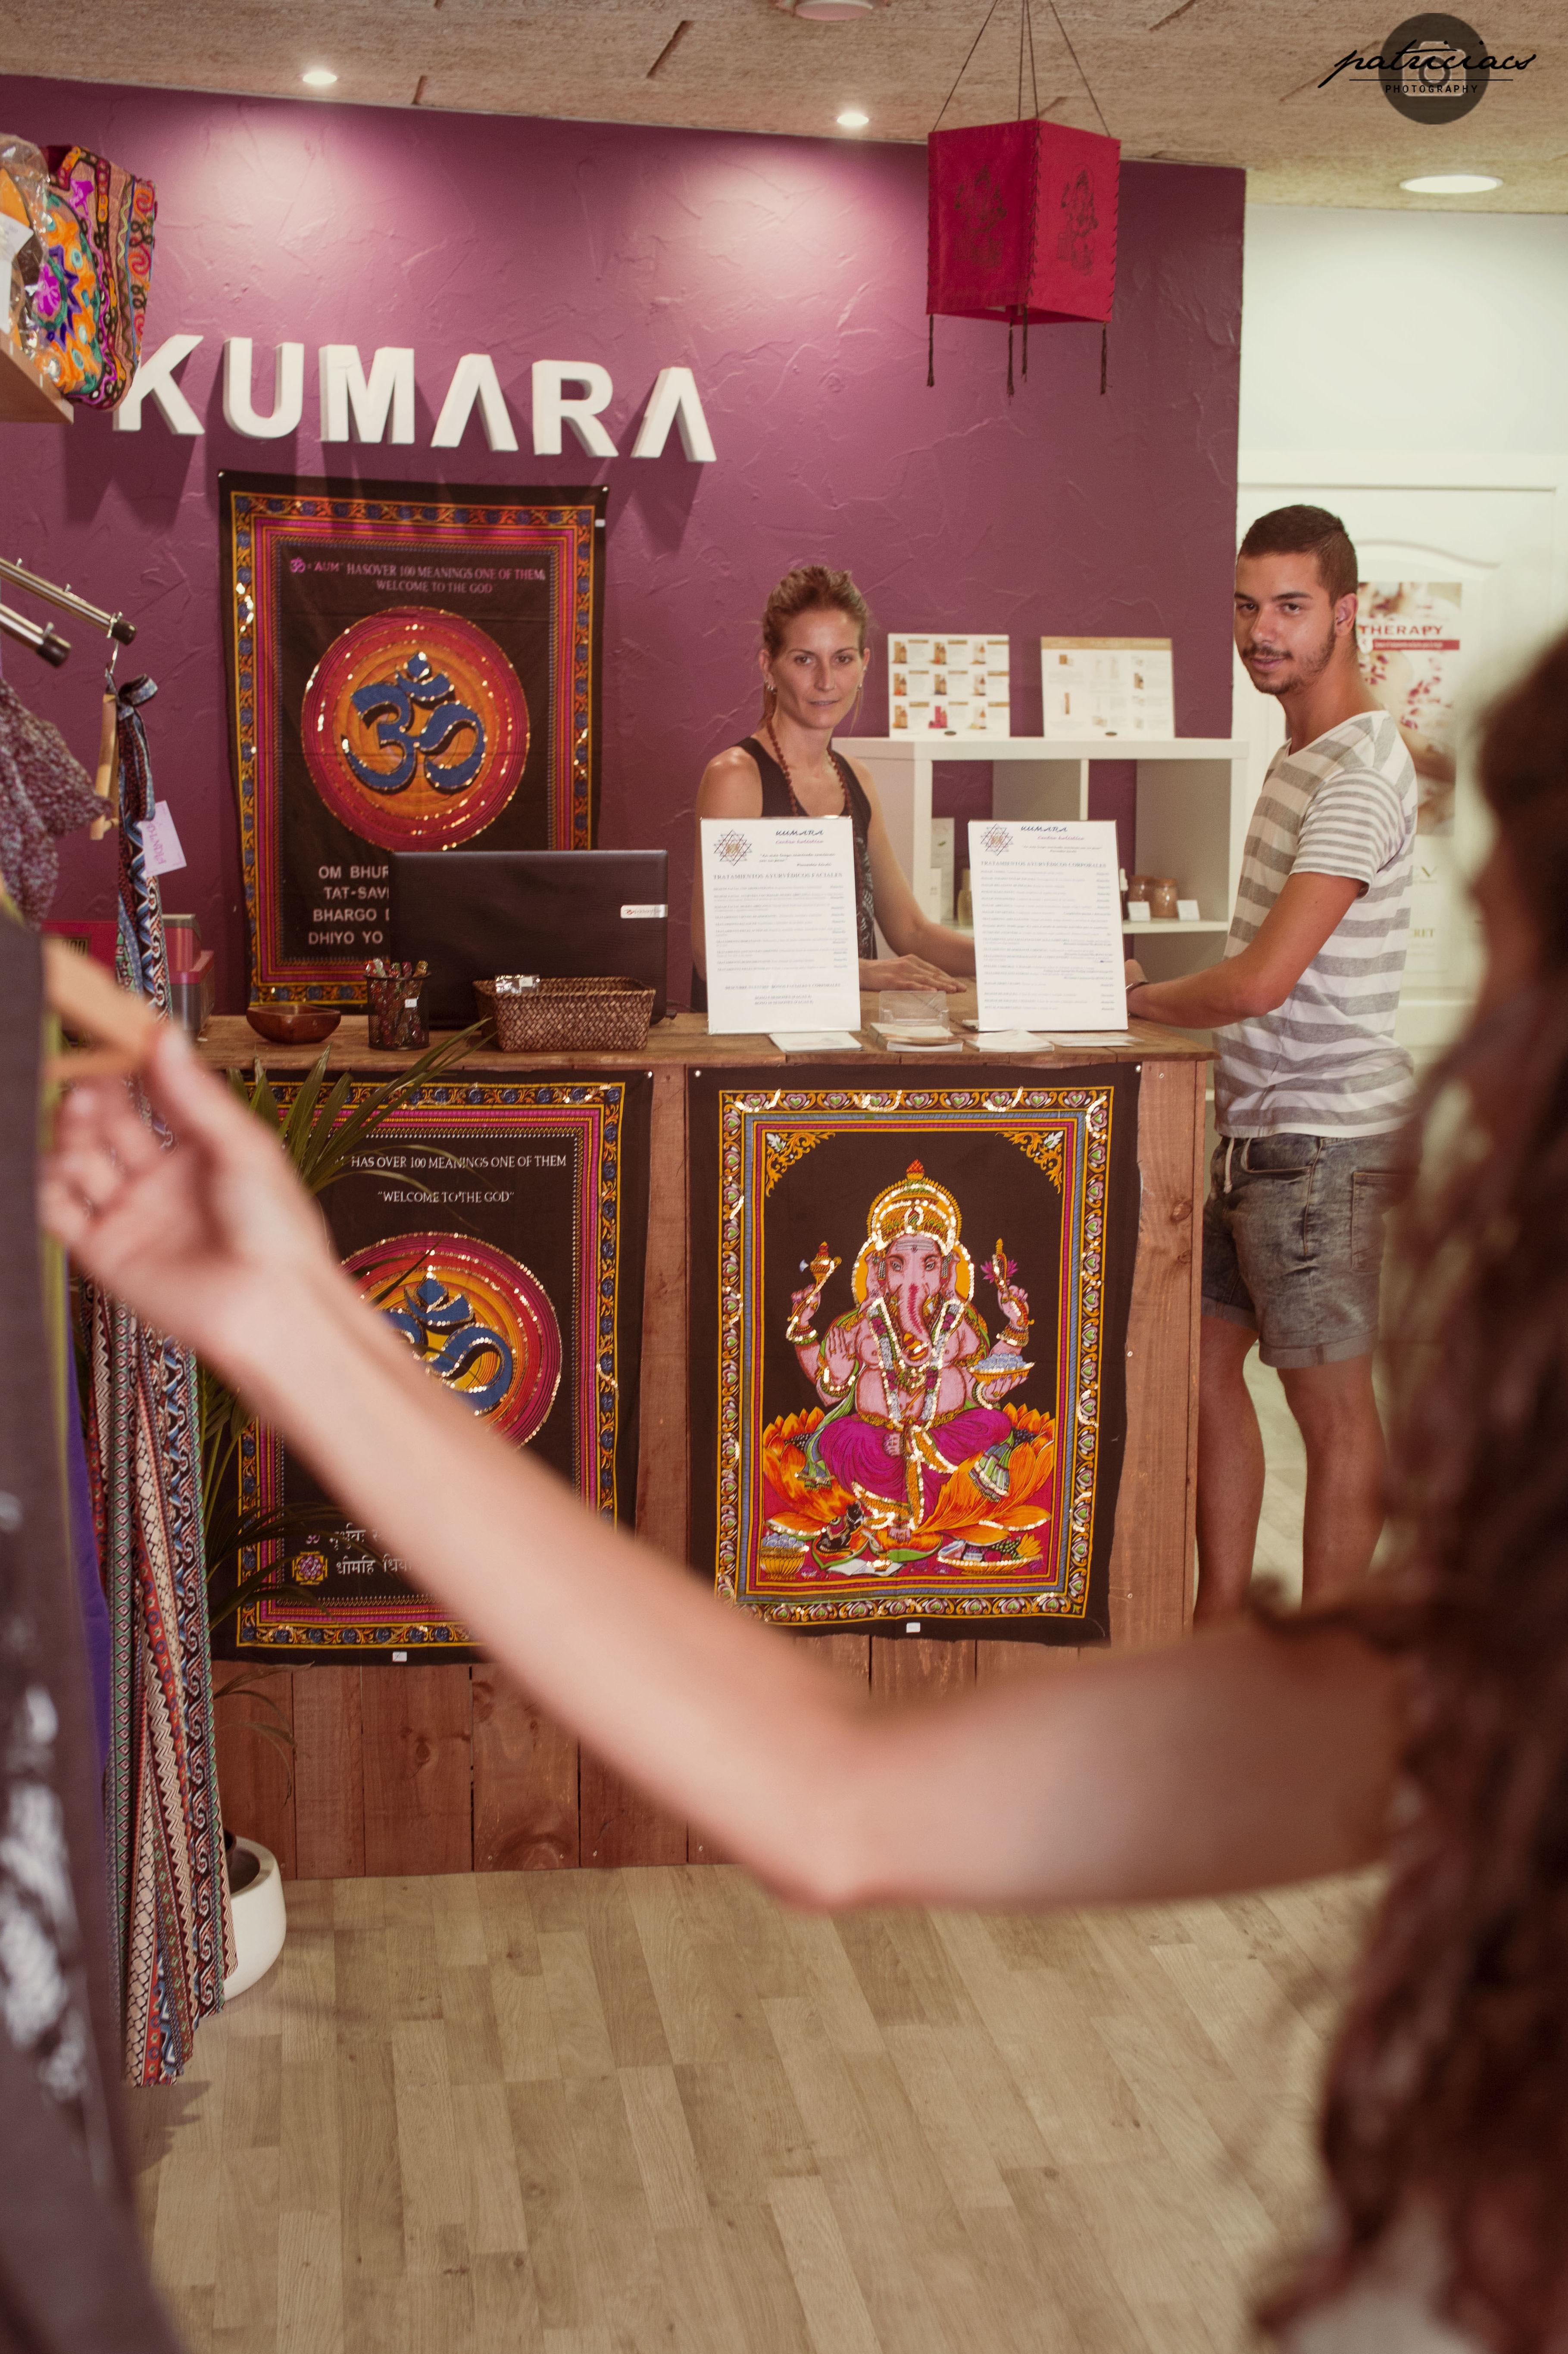 Vale descuento: Terapias y actividades de Kumara Centro Holístico